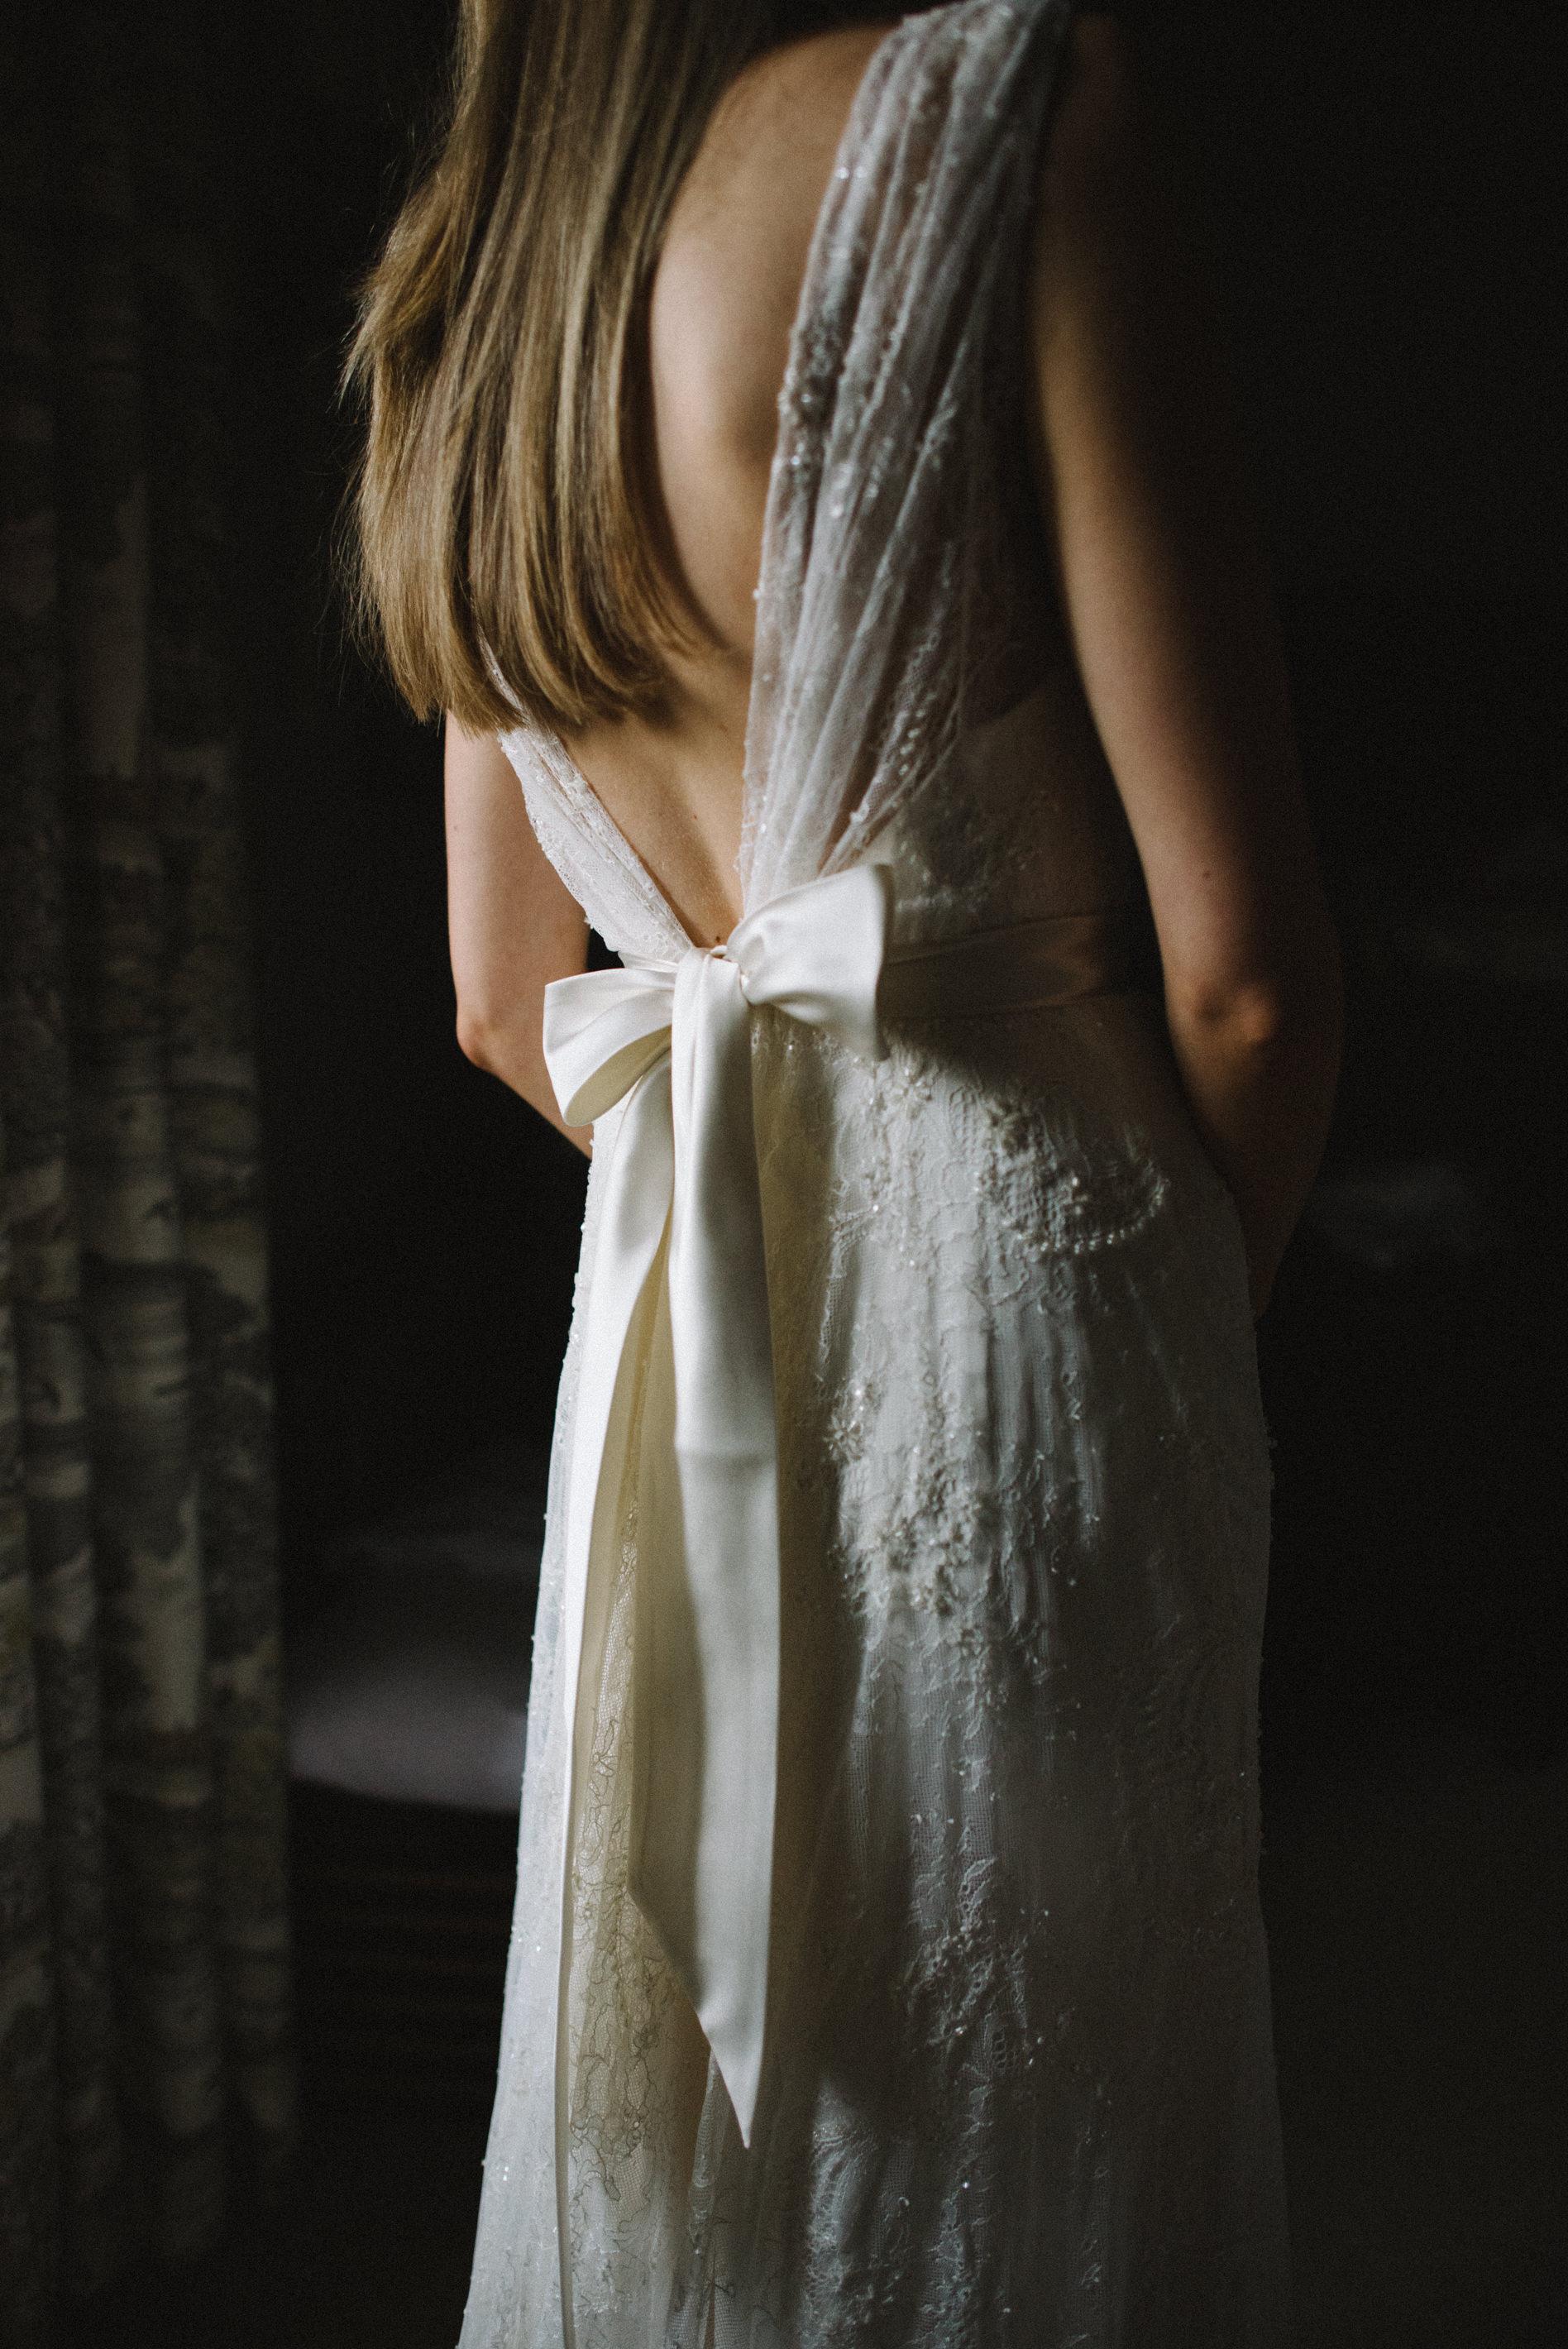 0085-LISA-DEVINE-PHOTOGRAPHY-ALTERNATIVE-WEDDING-PHOTOGRAPHY-SCOTLAND-DESTINATION-WEDDINGS-GLASGOW-WEDDINGS-COOL-WEDDINGS-STYLISH-WEDDINGS.JPG